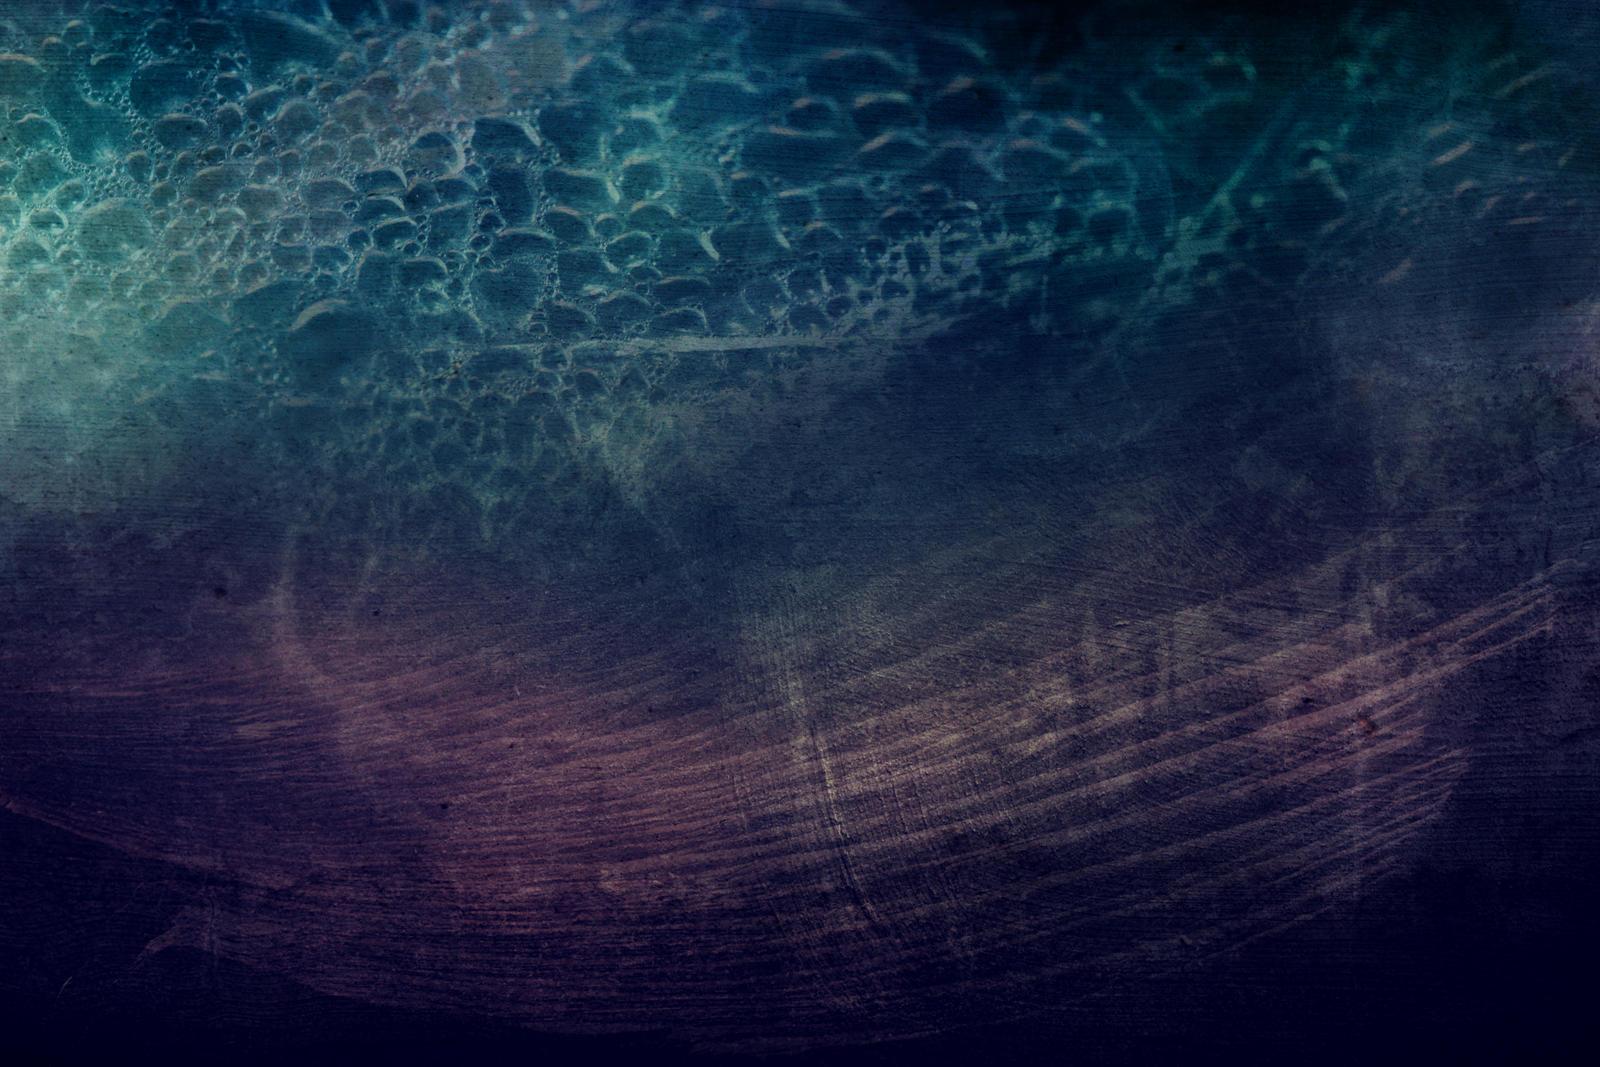 Whale texture - photo#5